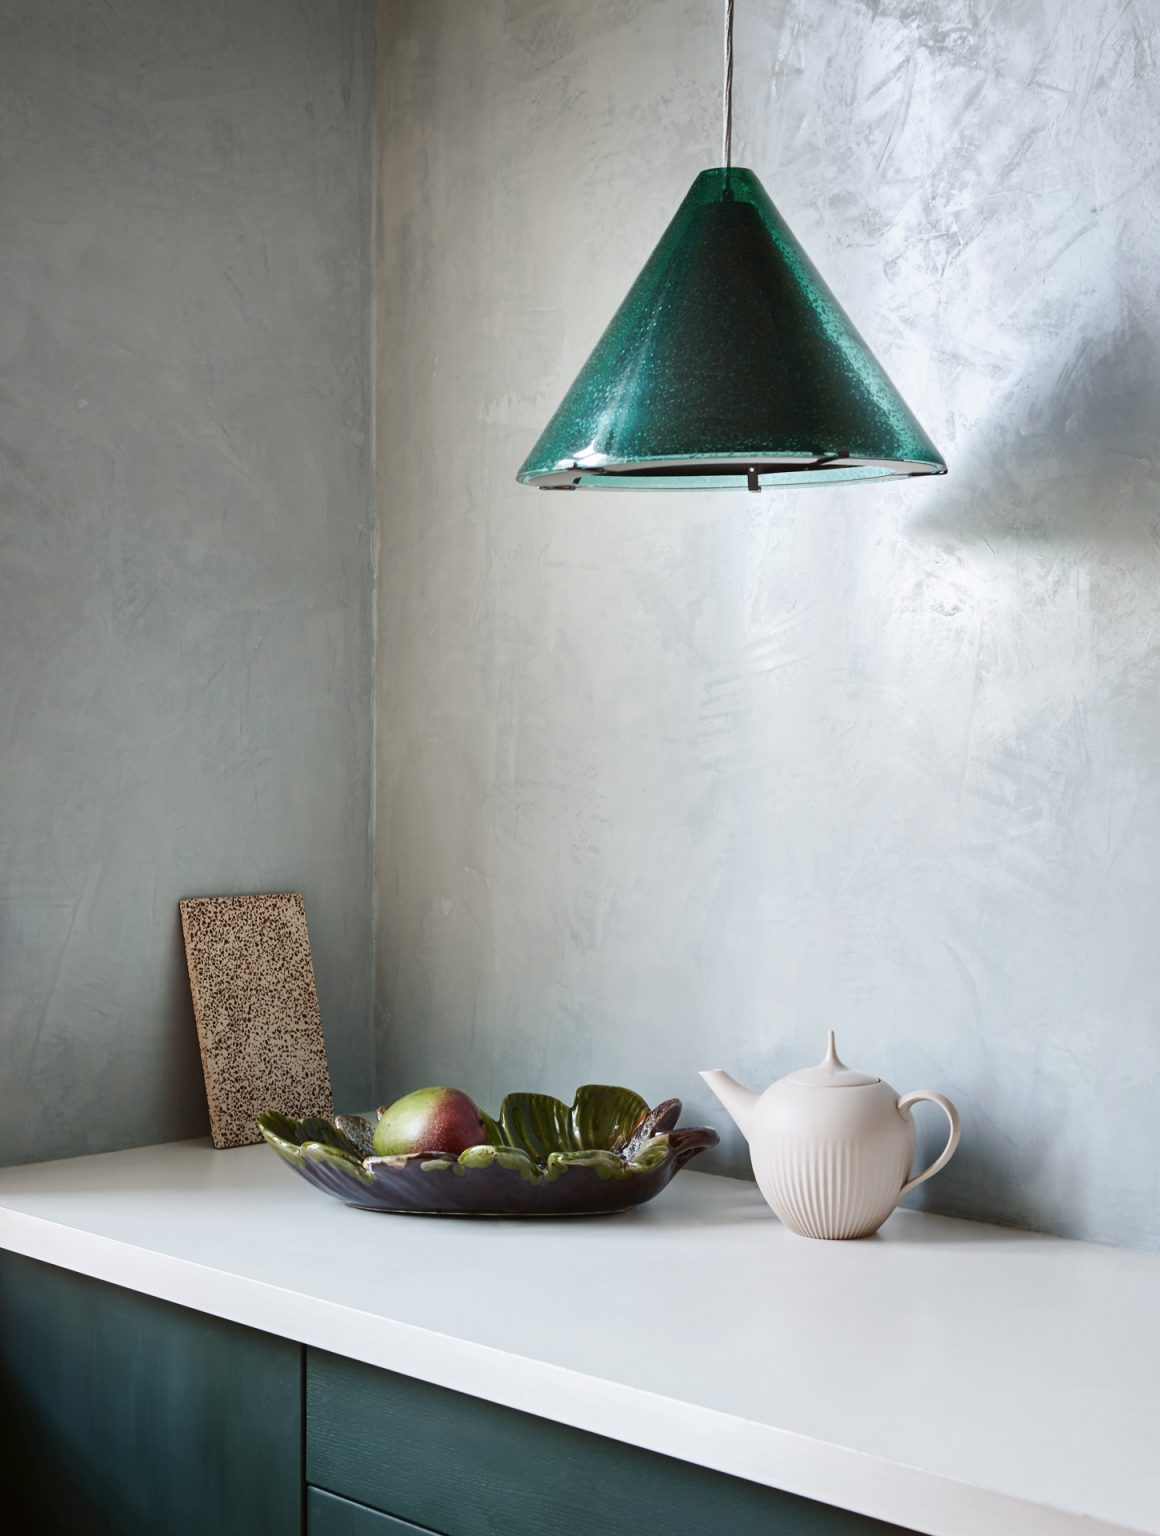 08_pure_original_polarblue_wall_blackhills_kitchencabinets